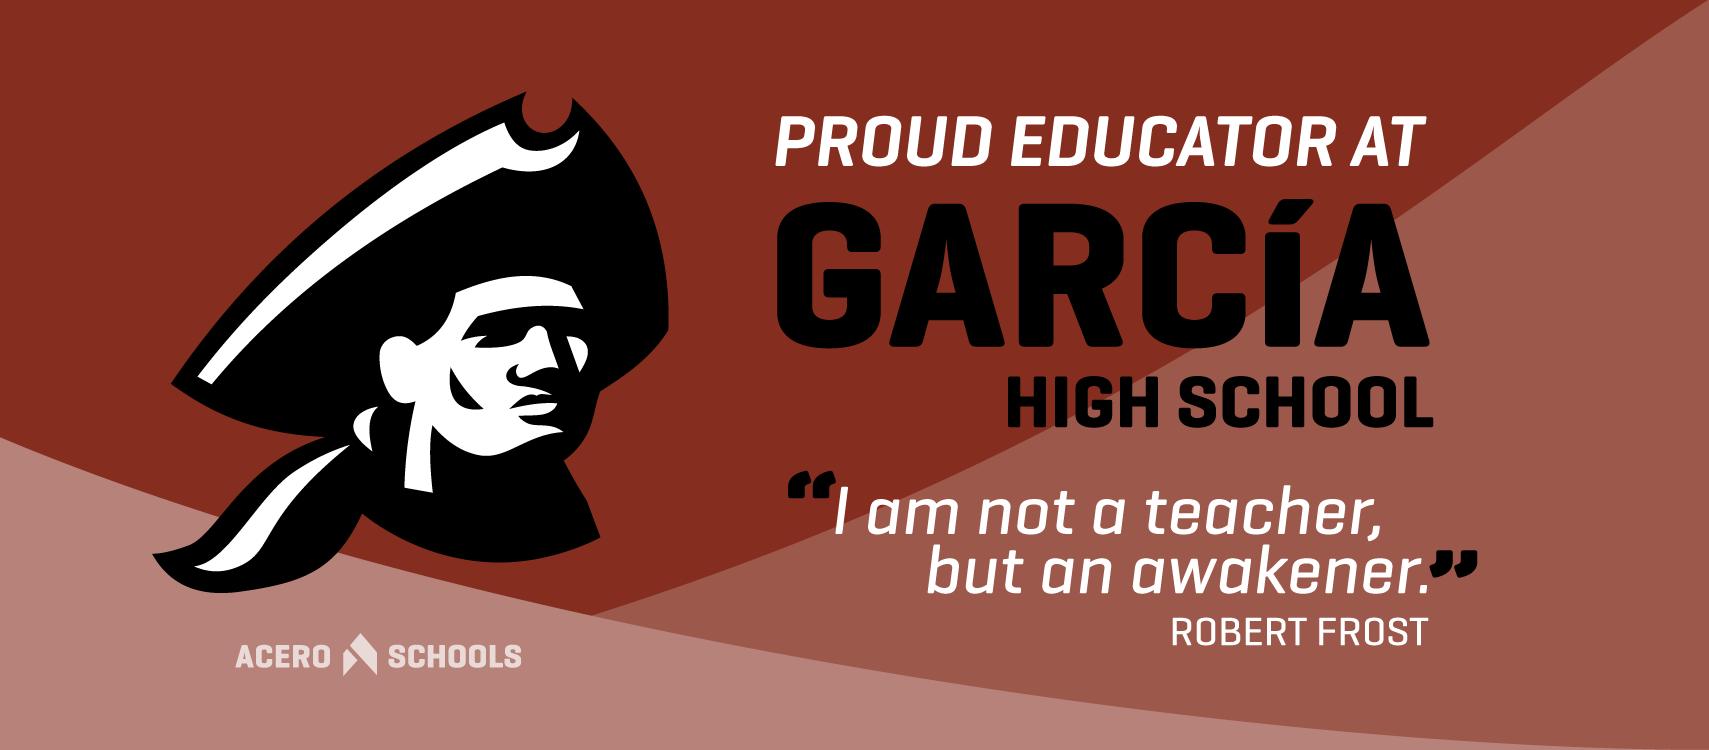 Garcia_Teacher_Cover